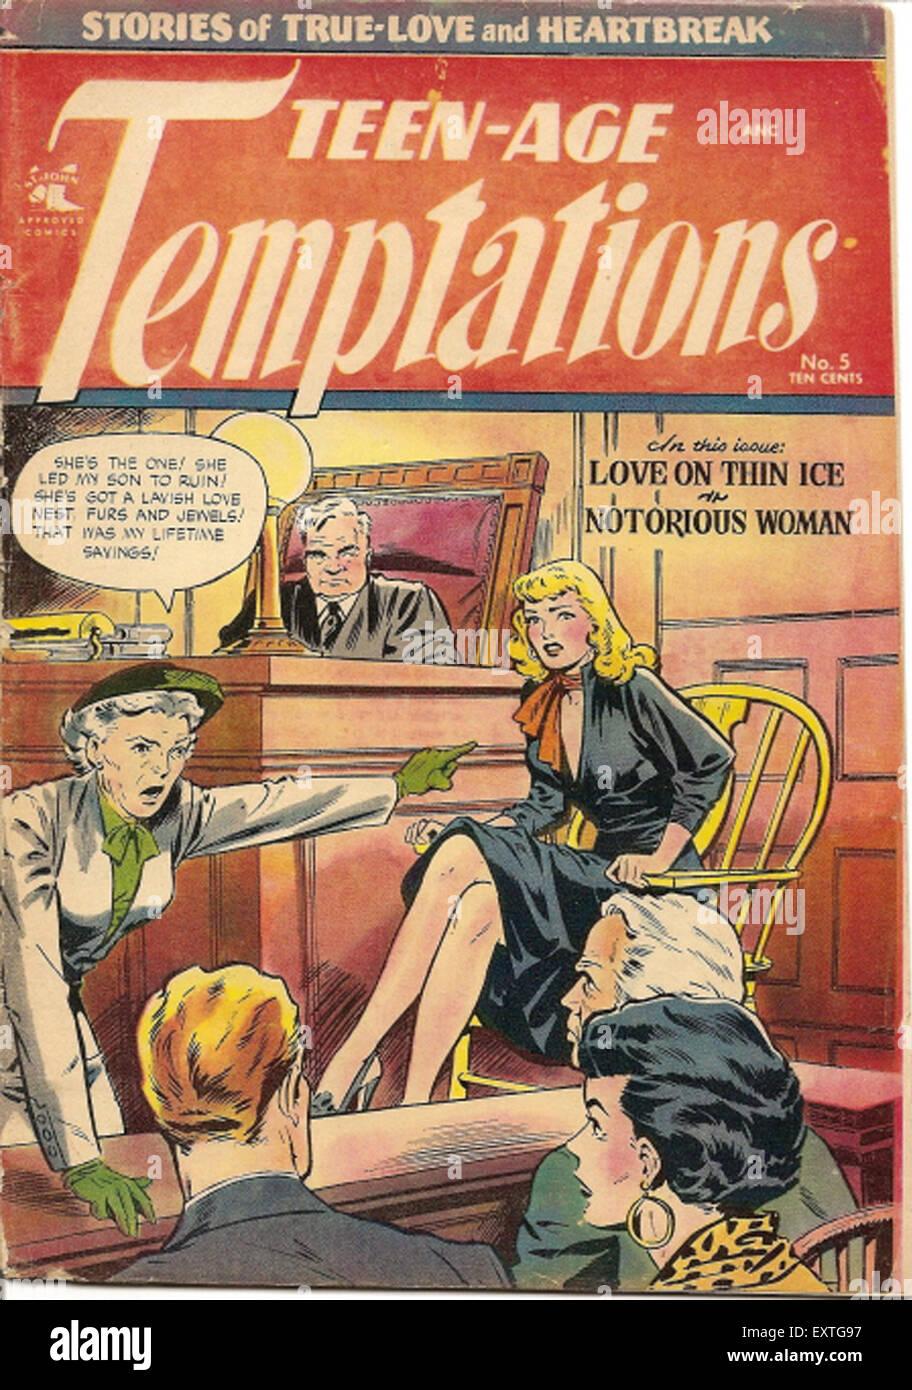 1950er Jahren USA Teen-Age Versuchungen Comic / jährliche Abdeckung Stockbild